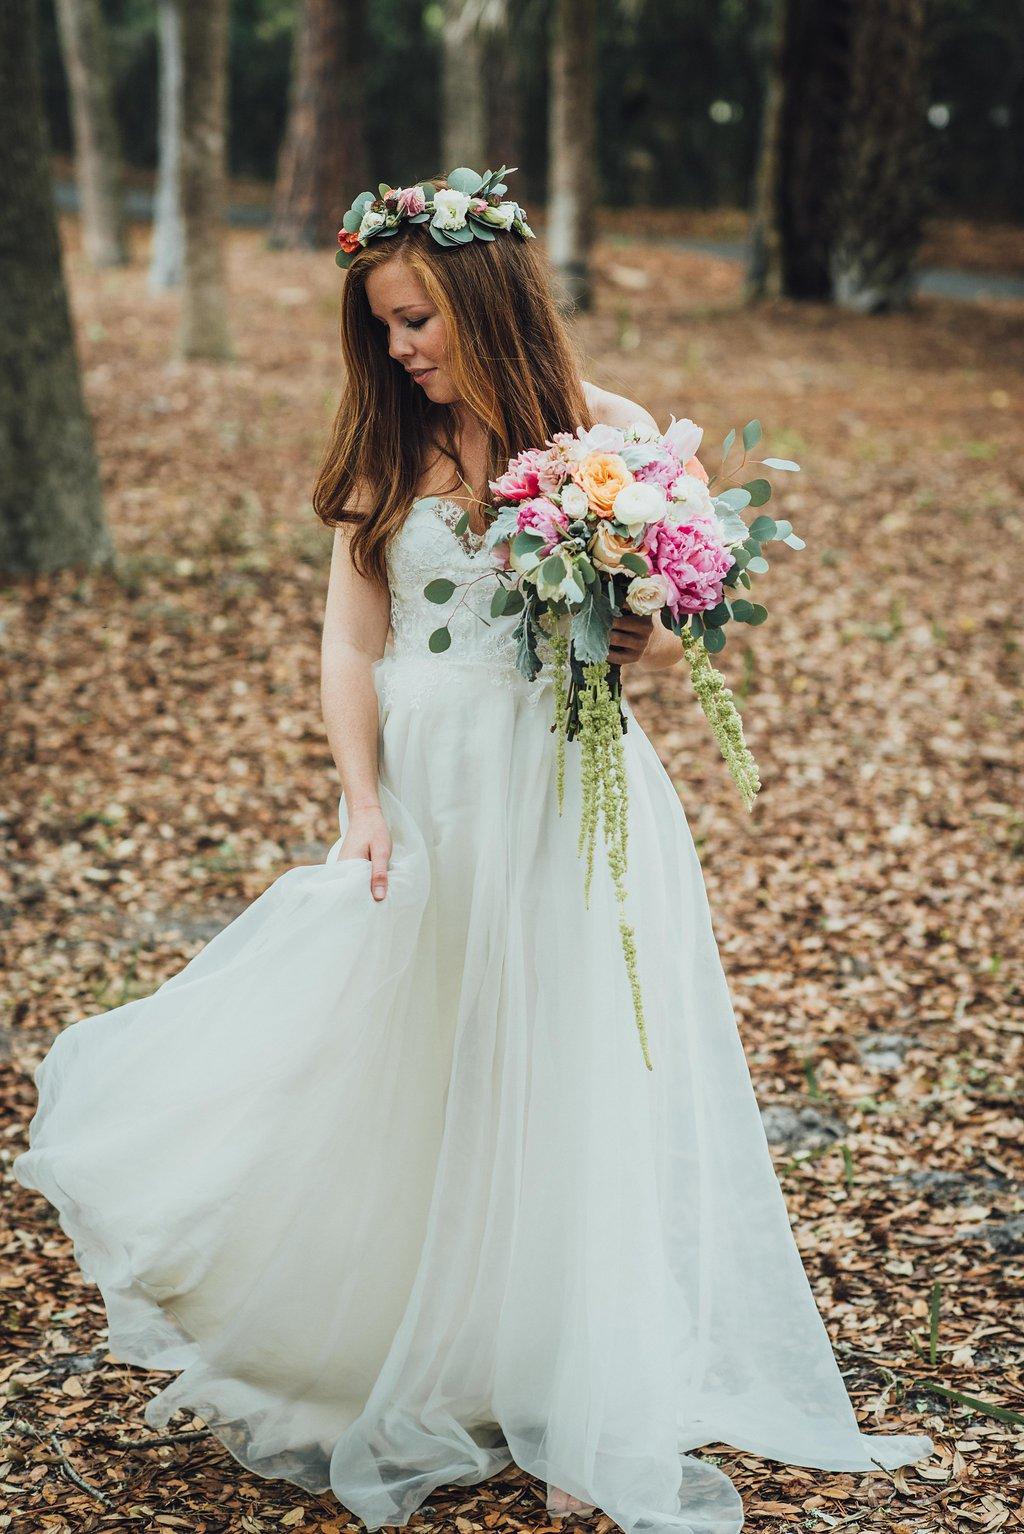 Urban-Poppy-Southern-Wedding-Mallory-and-Justin-photography-ivory-and-beau-bridal-boutique-sarah-seven-marion-boho-bride-indie-bride-indie-wedding-dress-savannah-weddings-hilton-head-weddings-beach-wedding-5.jpg